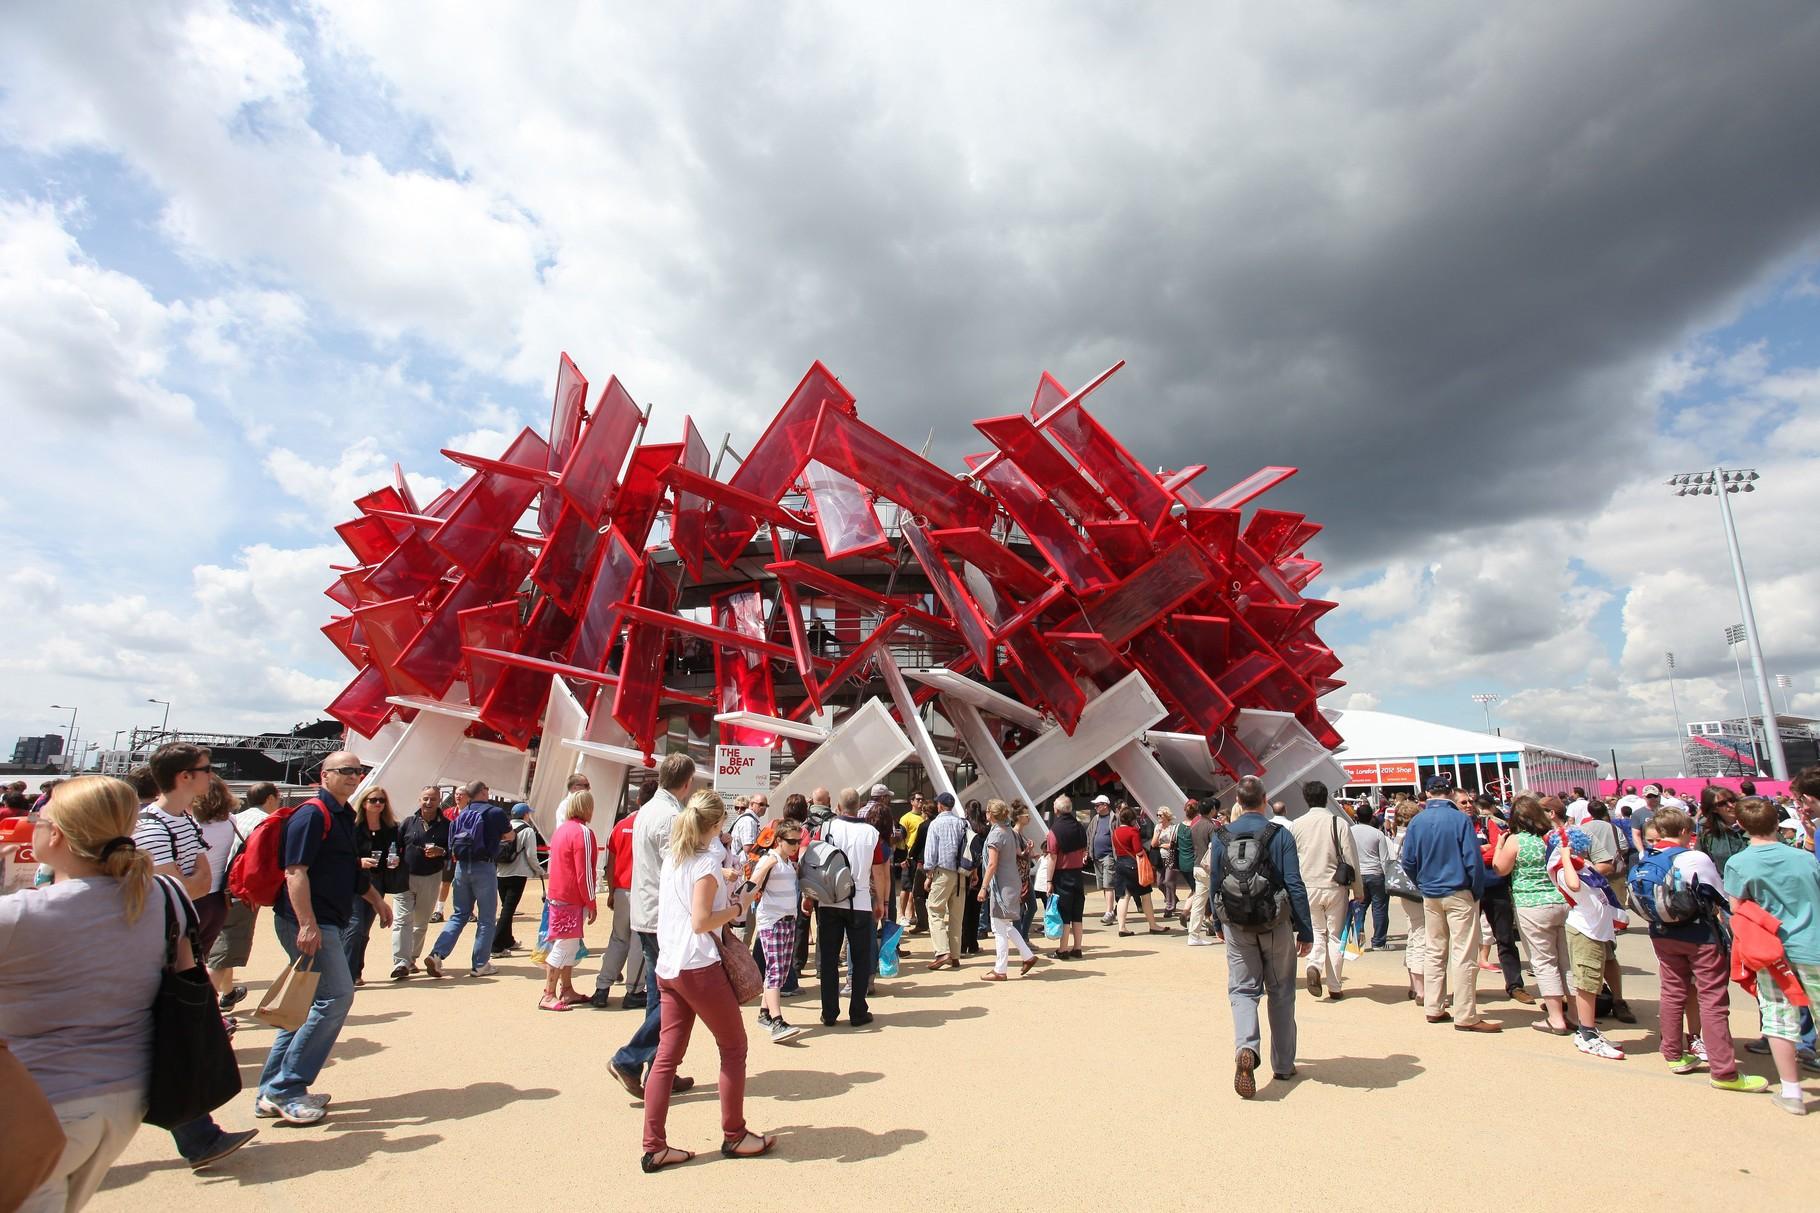 Coca-Cola Beat Box, Olympic Games 2012 London / Picture: NUSSLI